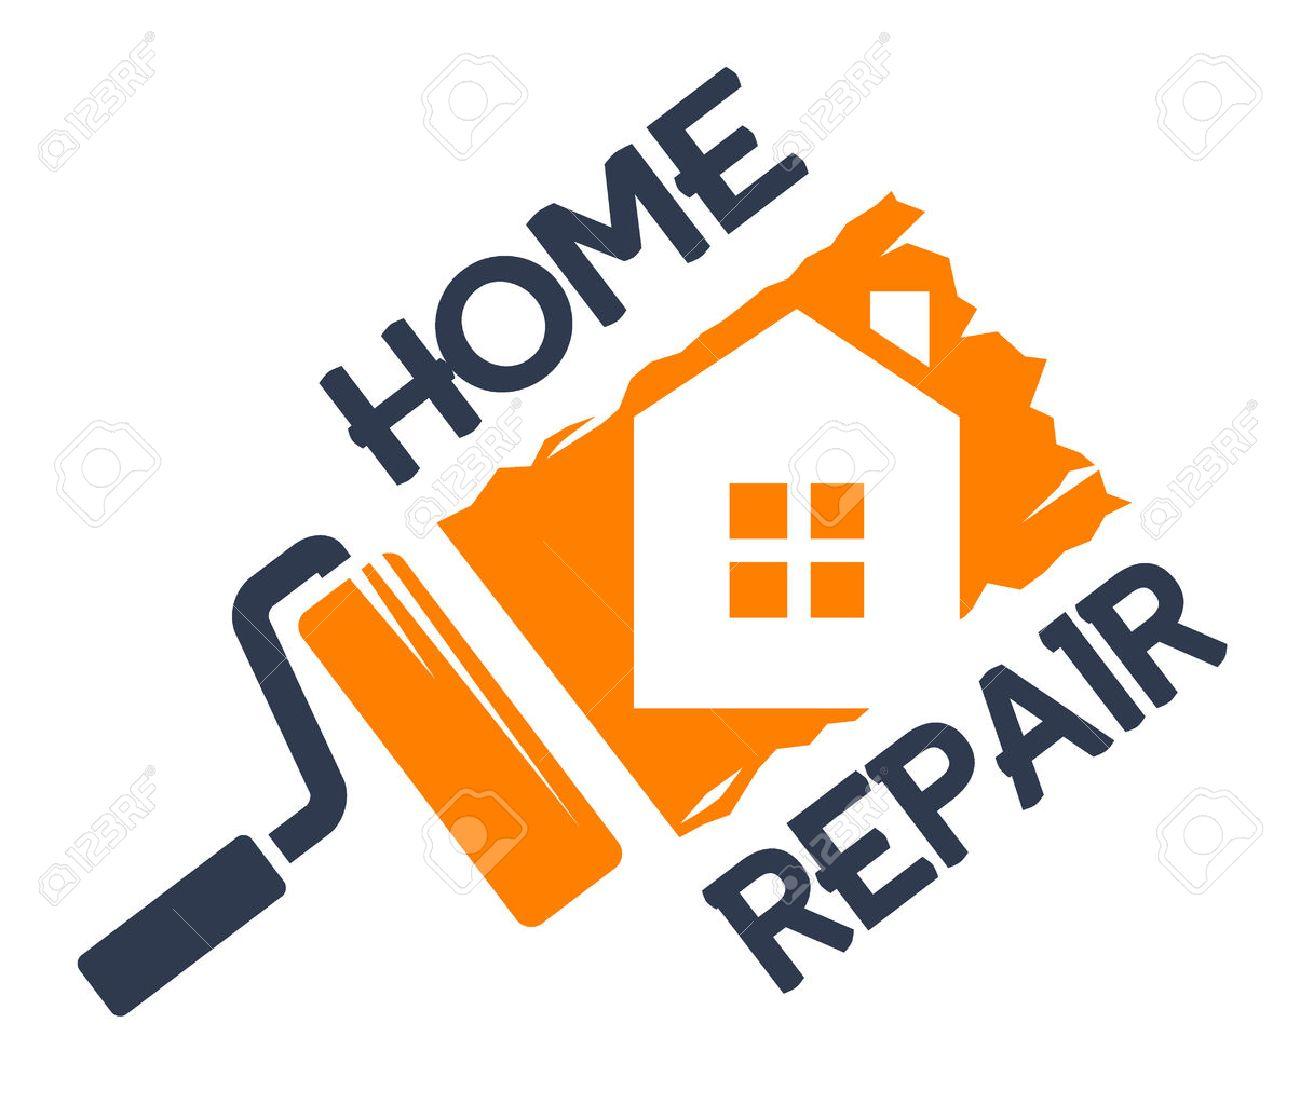 The emblem of home repair. Vector illustration. - 45946244